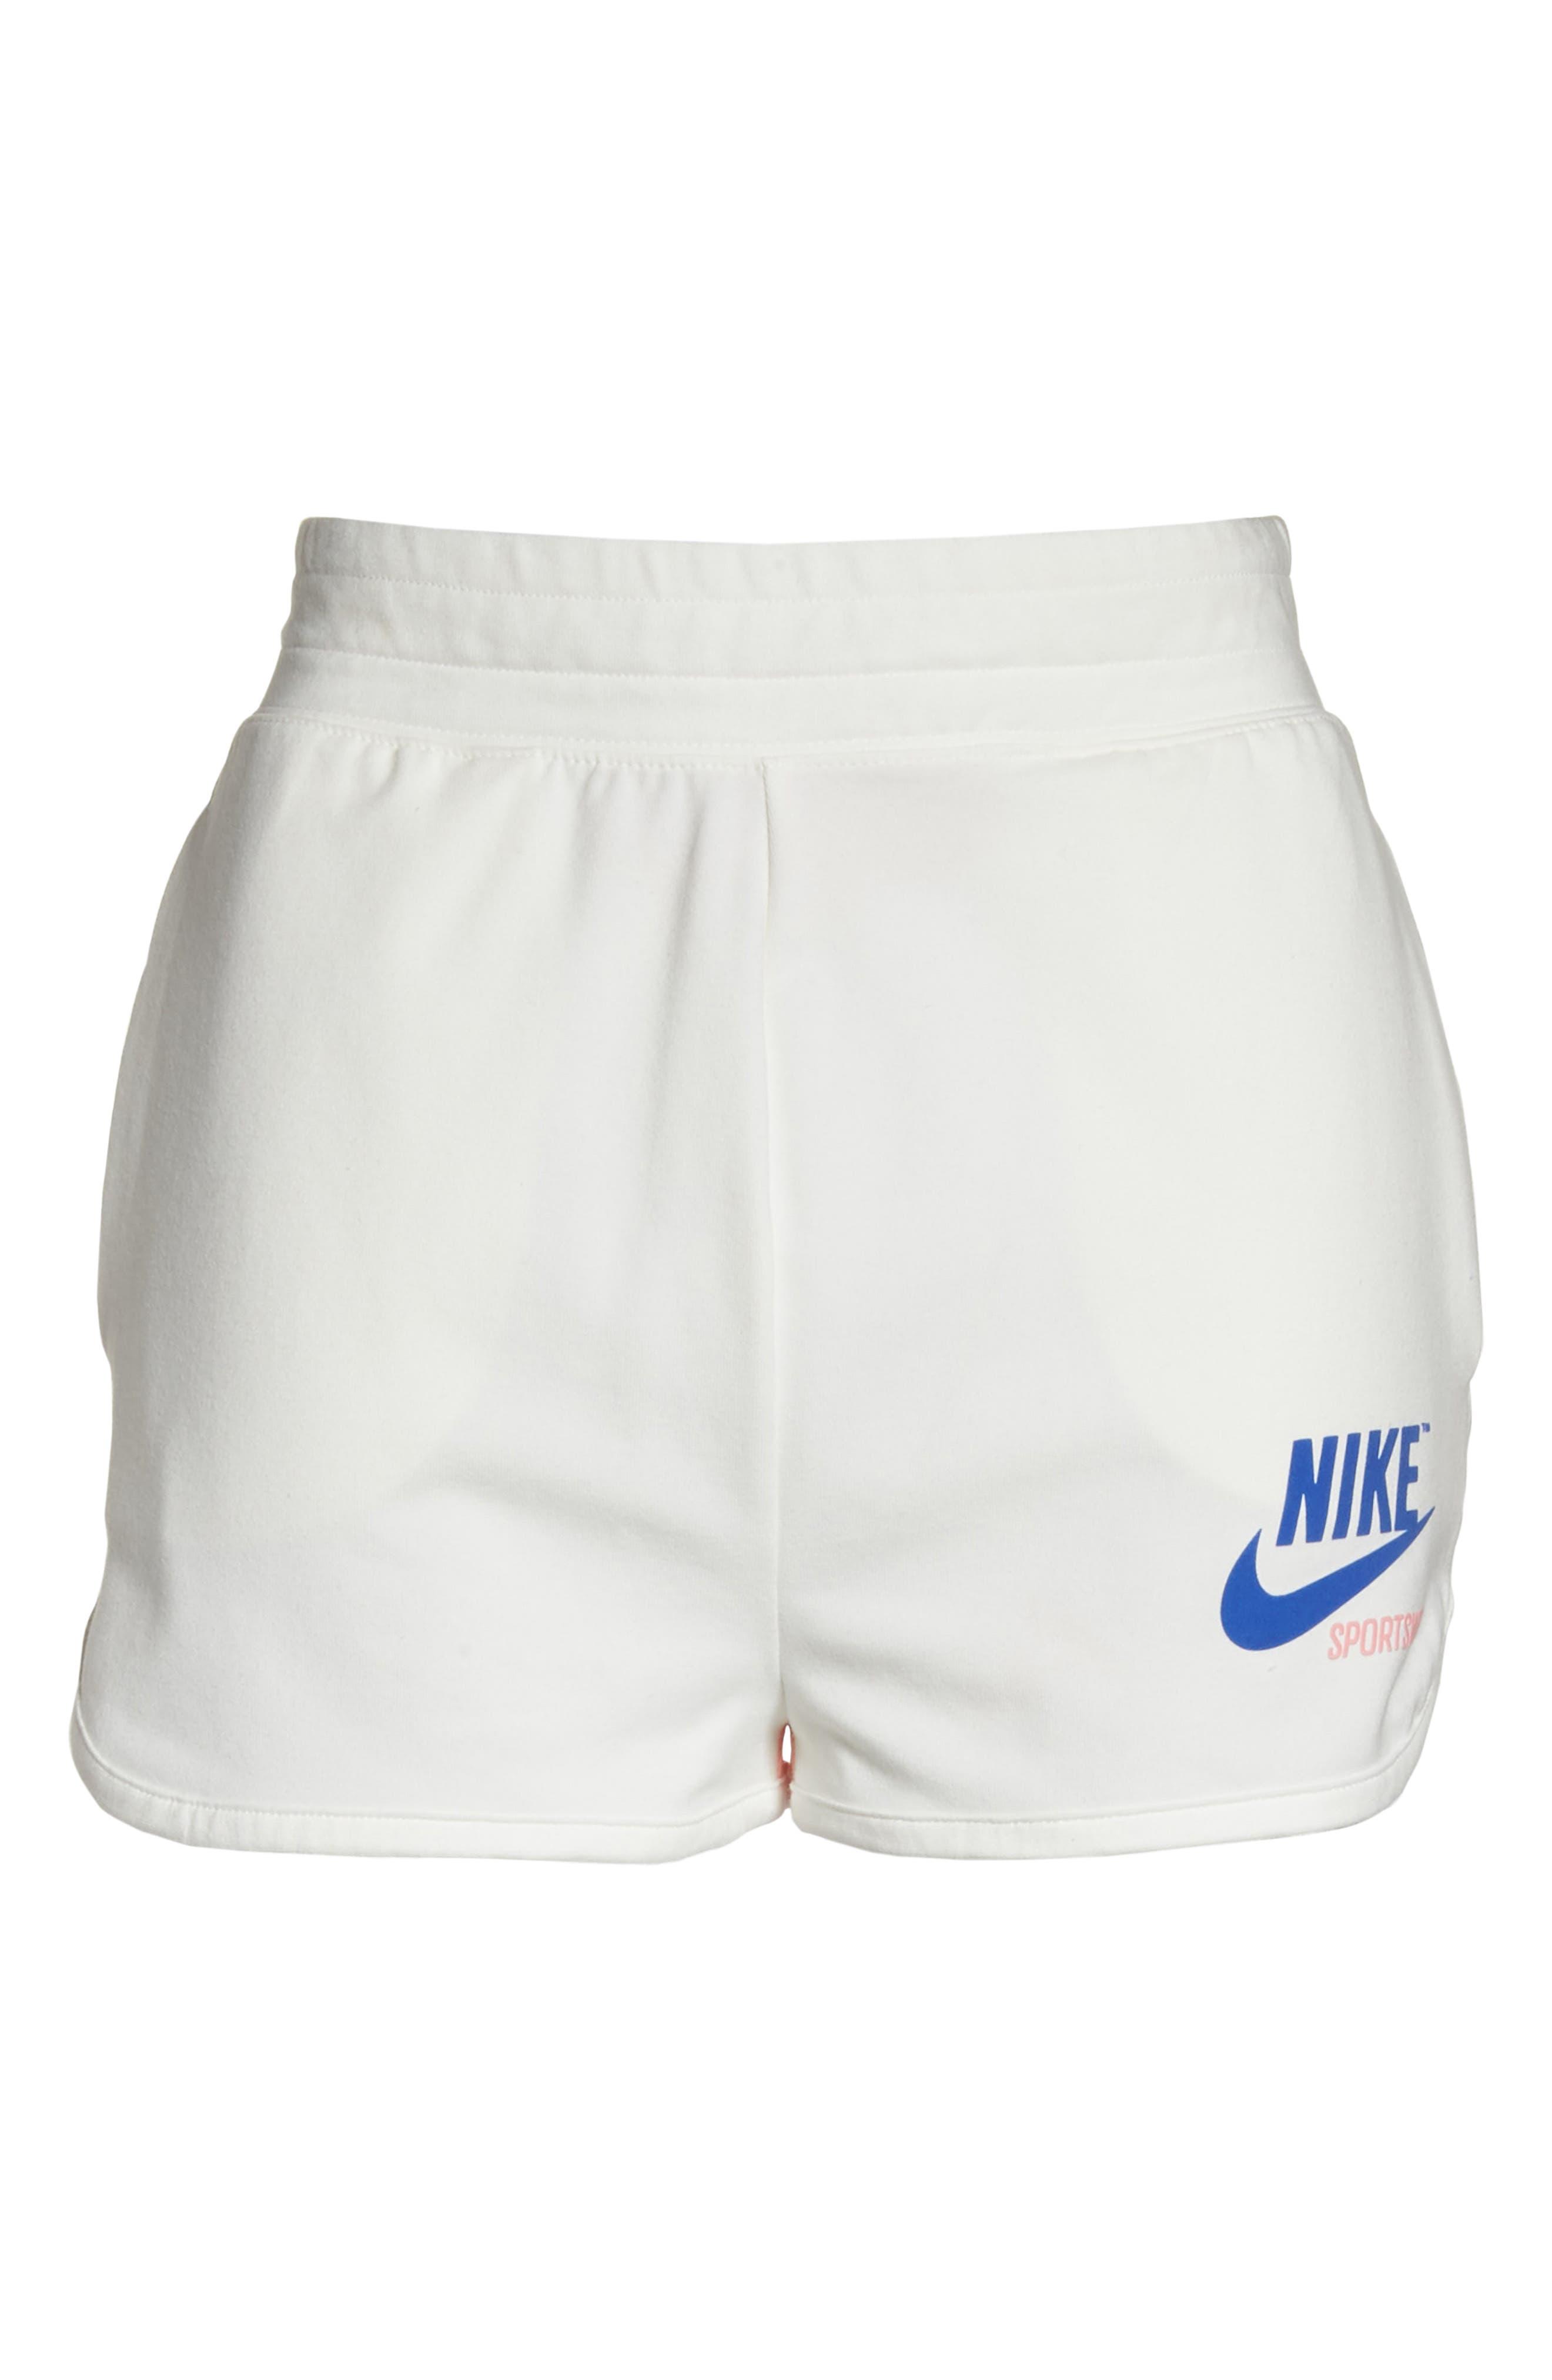 Sportswear High Waist Archive Shorts,                             Alternate thumbnail 7, color,                             900